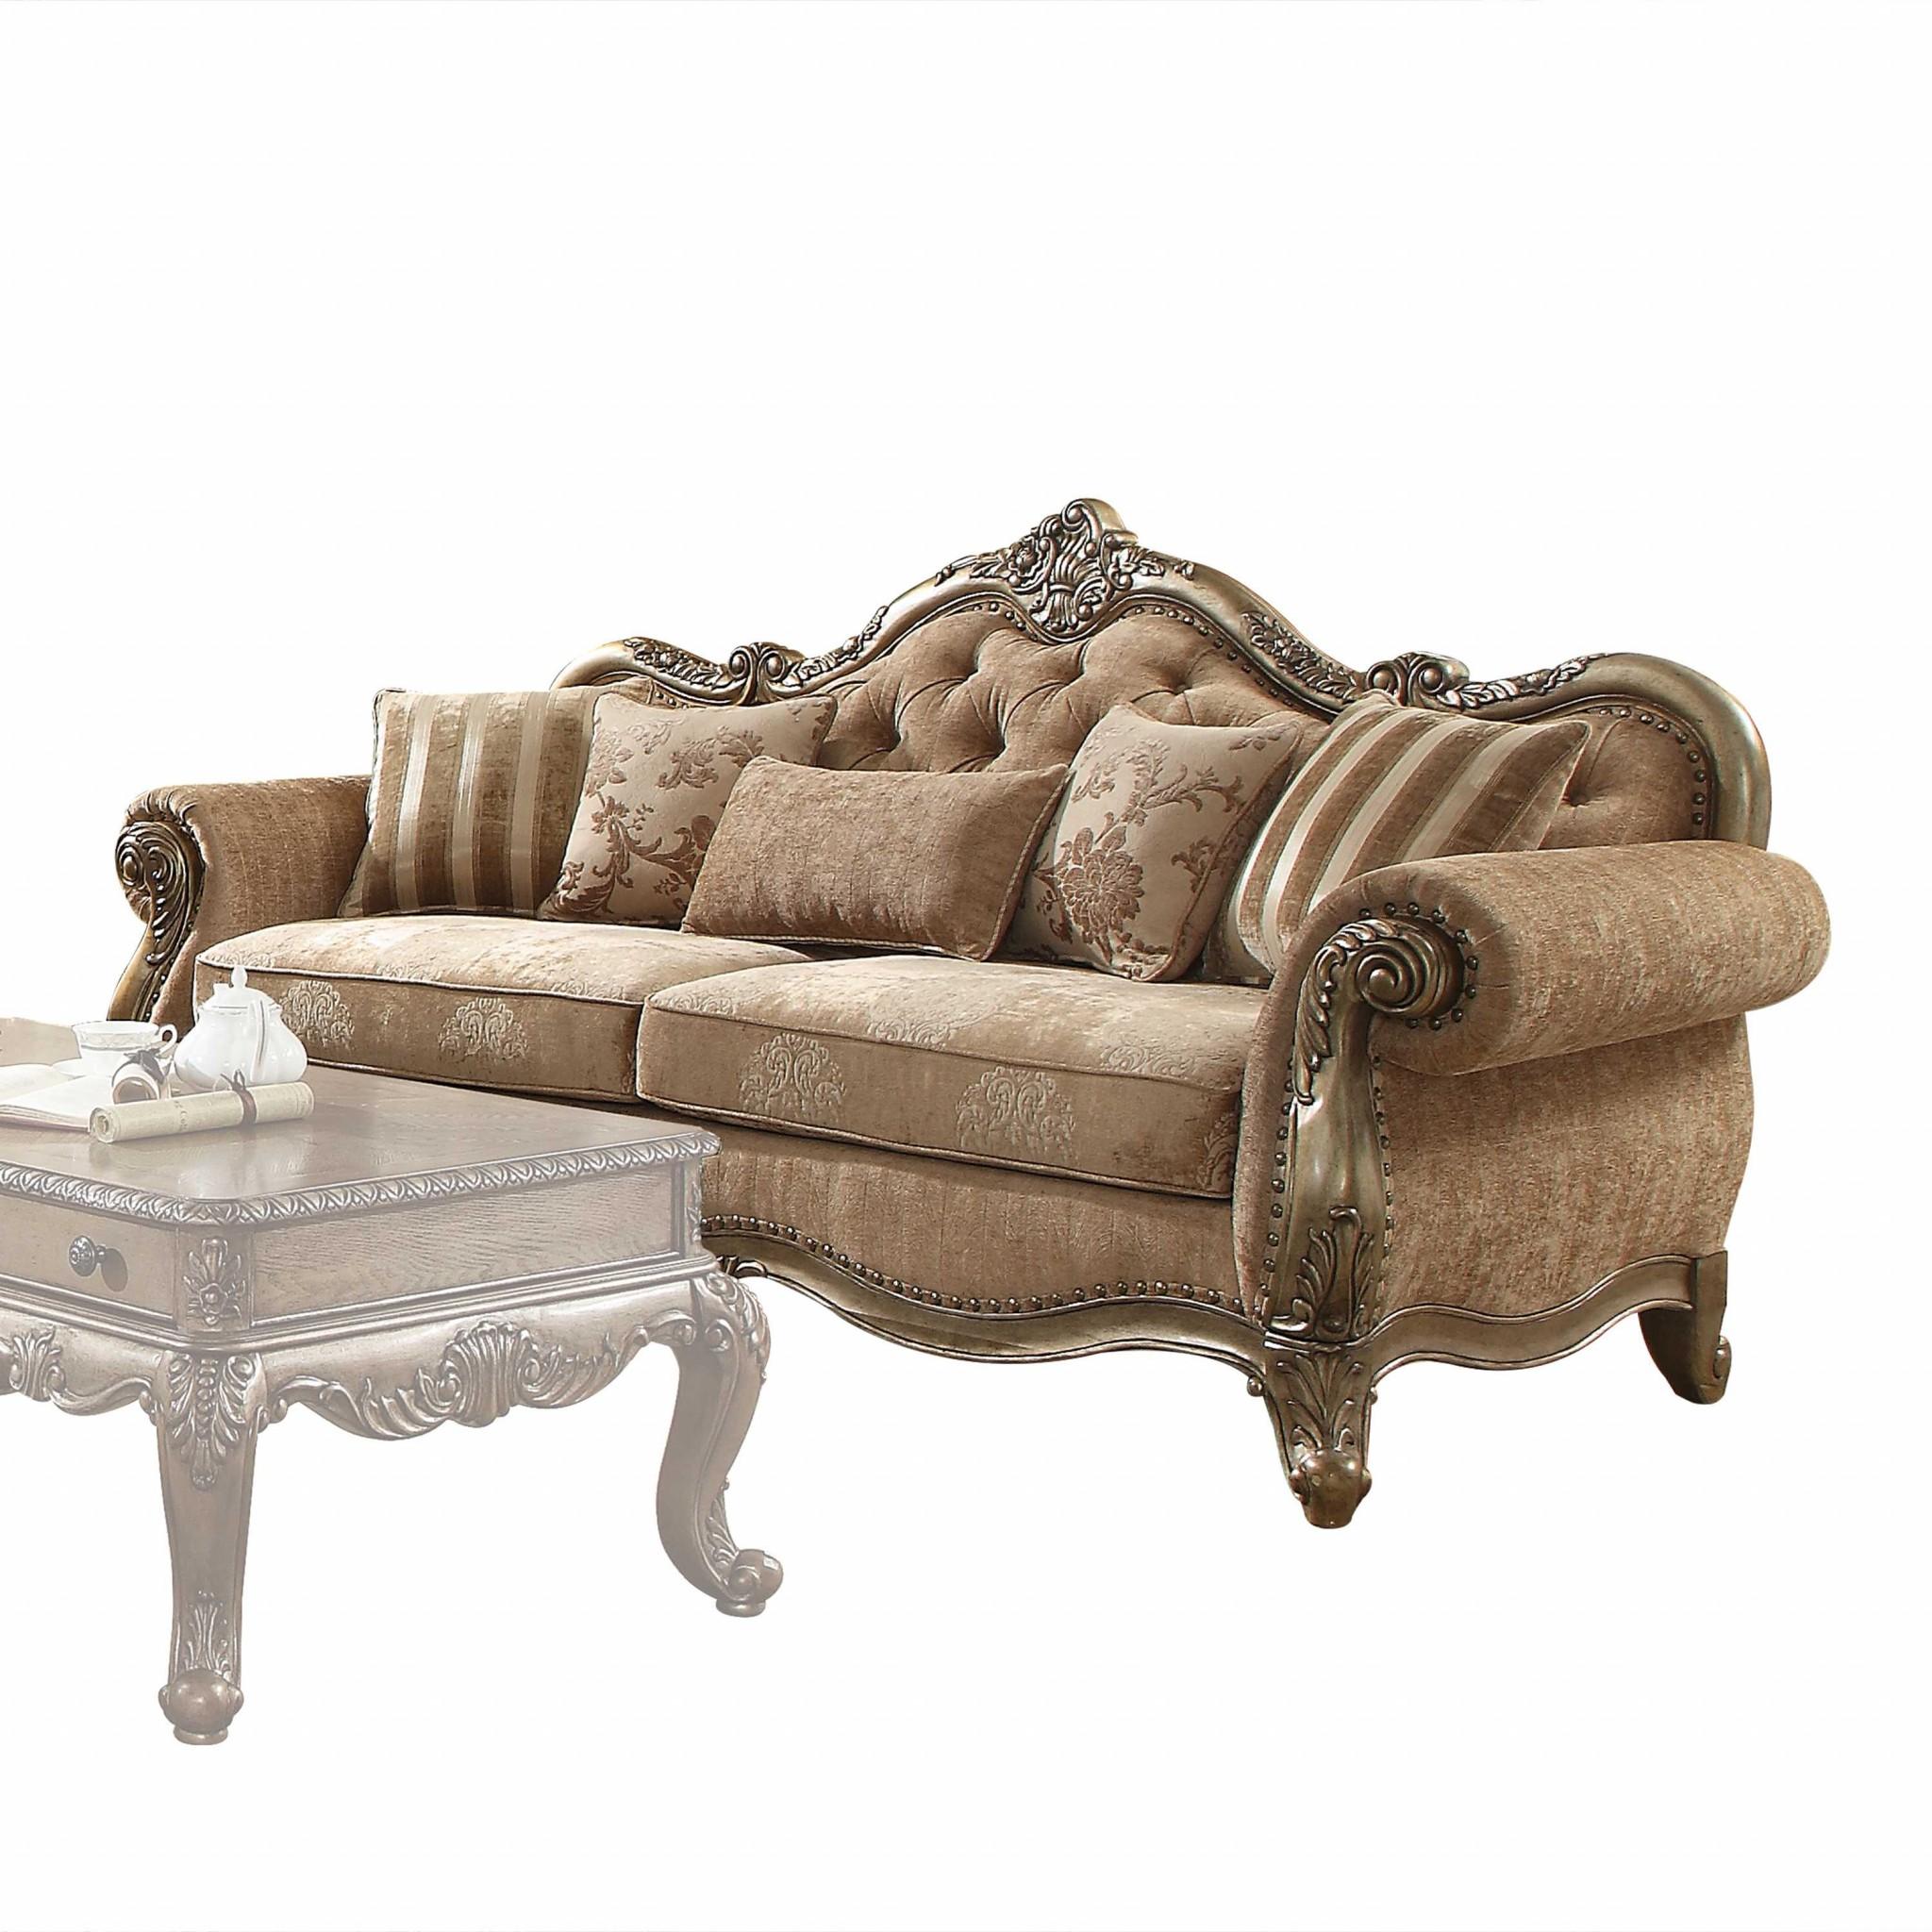 "35"" X 93"" X 42"" Fabric Vintage Oak Upholstery Poly Resin Sofa w/5 Pillows"